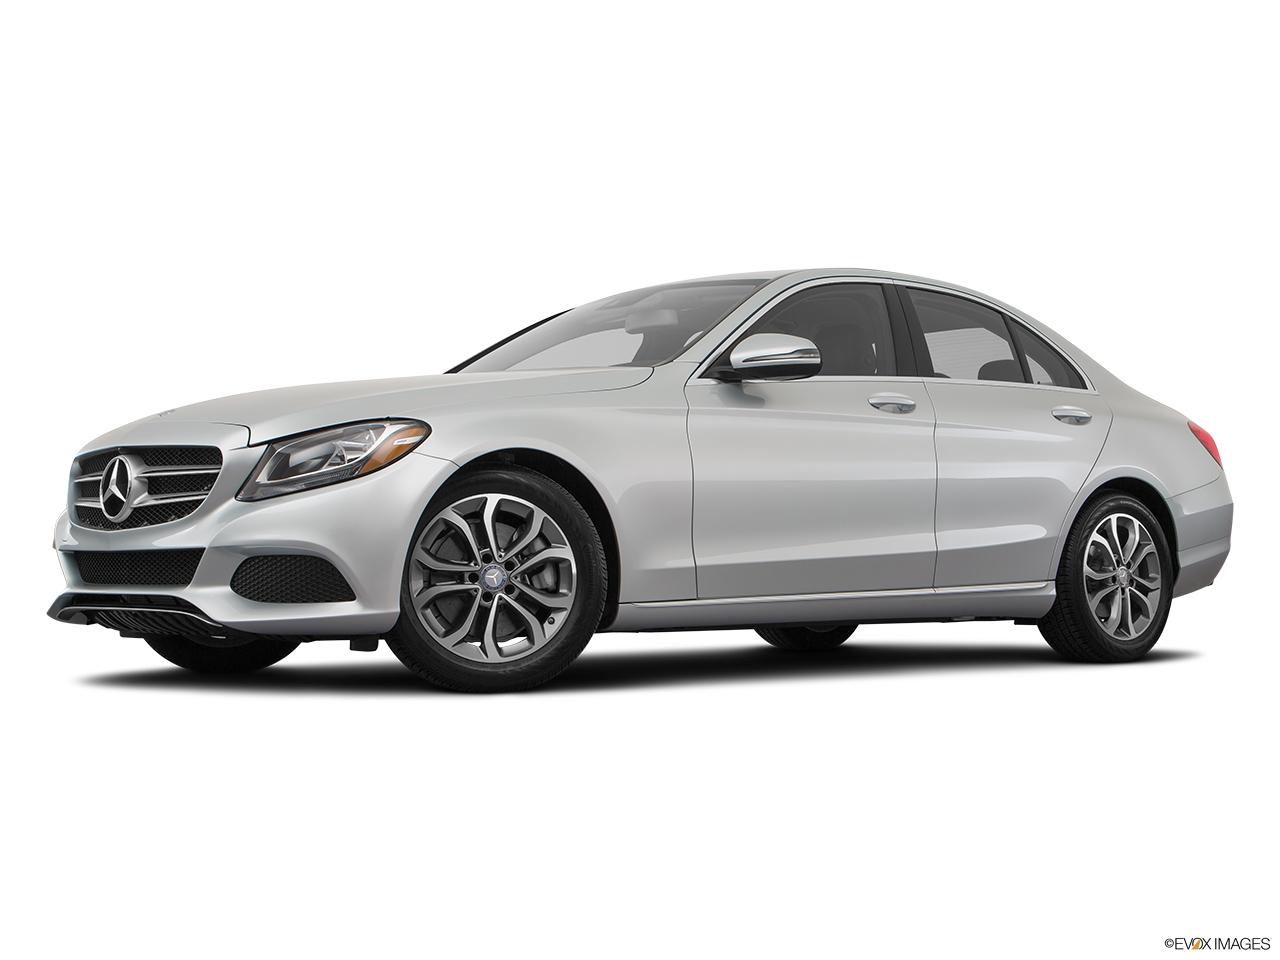 Car pictures list for mercedes benz c class 2018 c 180 for Mercedes benz list